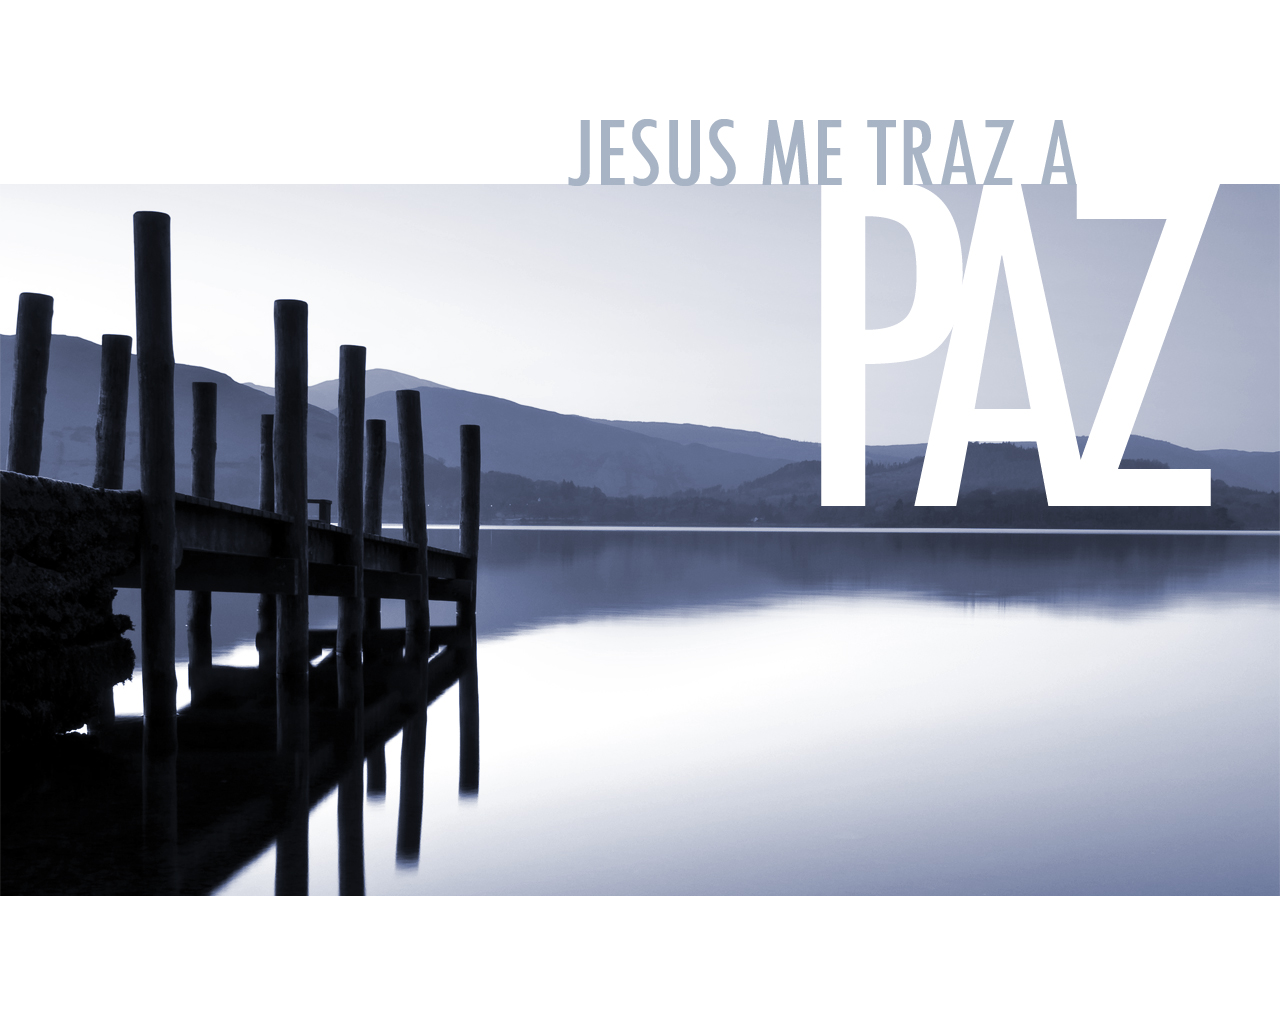 http://4.bp.blogspot.com/-CiyAhWUEzes/TbJLlVlOJ6I/AAAAAAAAAI0/SsQo1O2b1zw/s1600/wallpaper-jesus-traz-a-paz-021.jpg